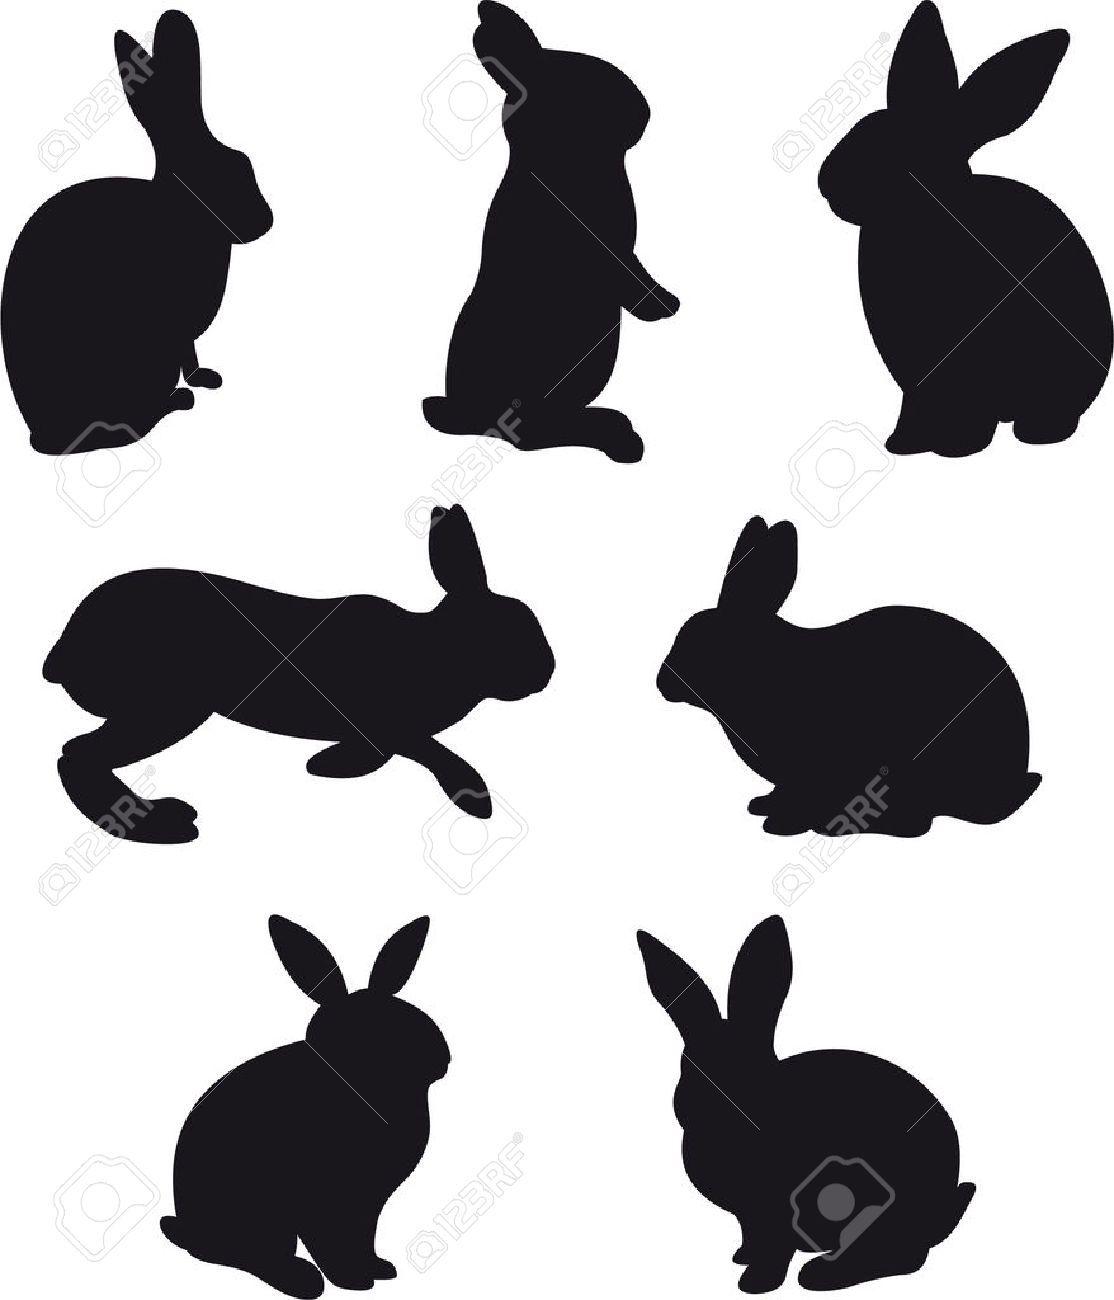 bunny head clipart.